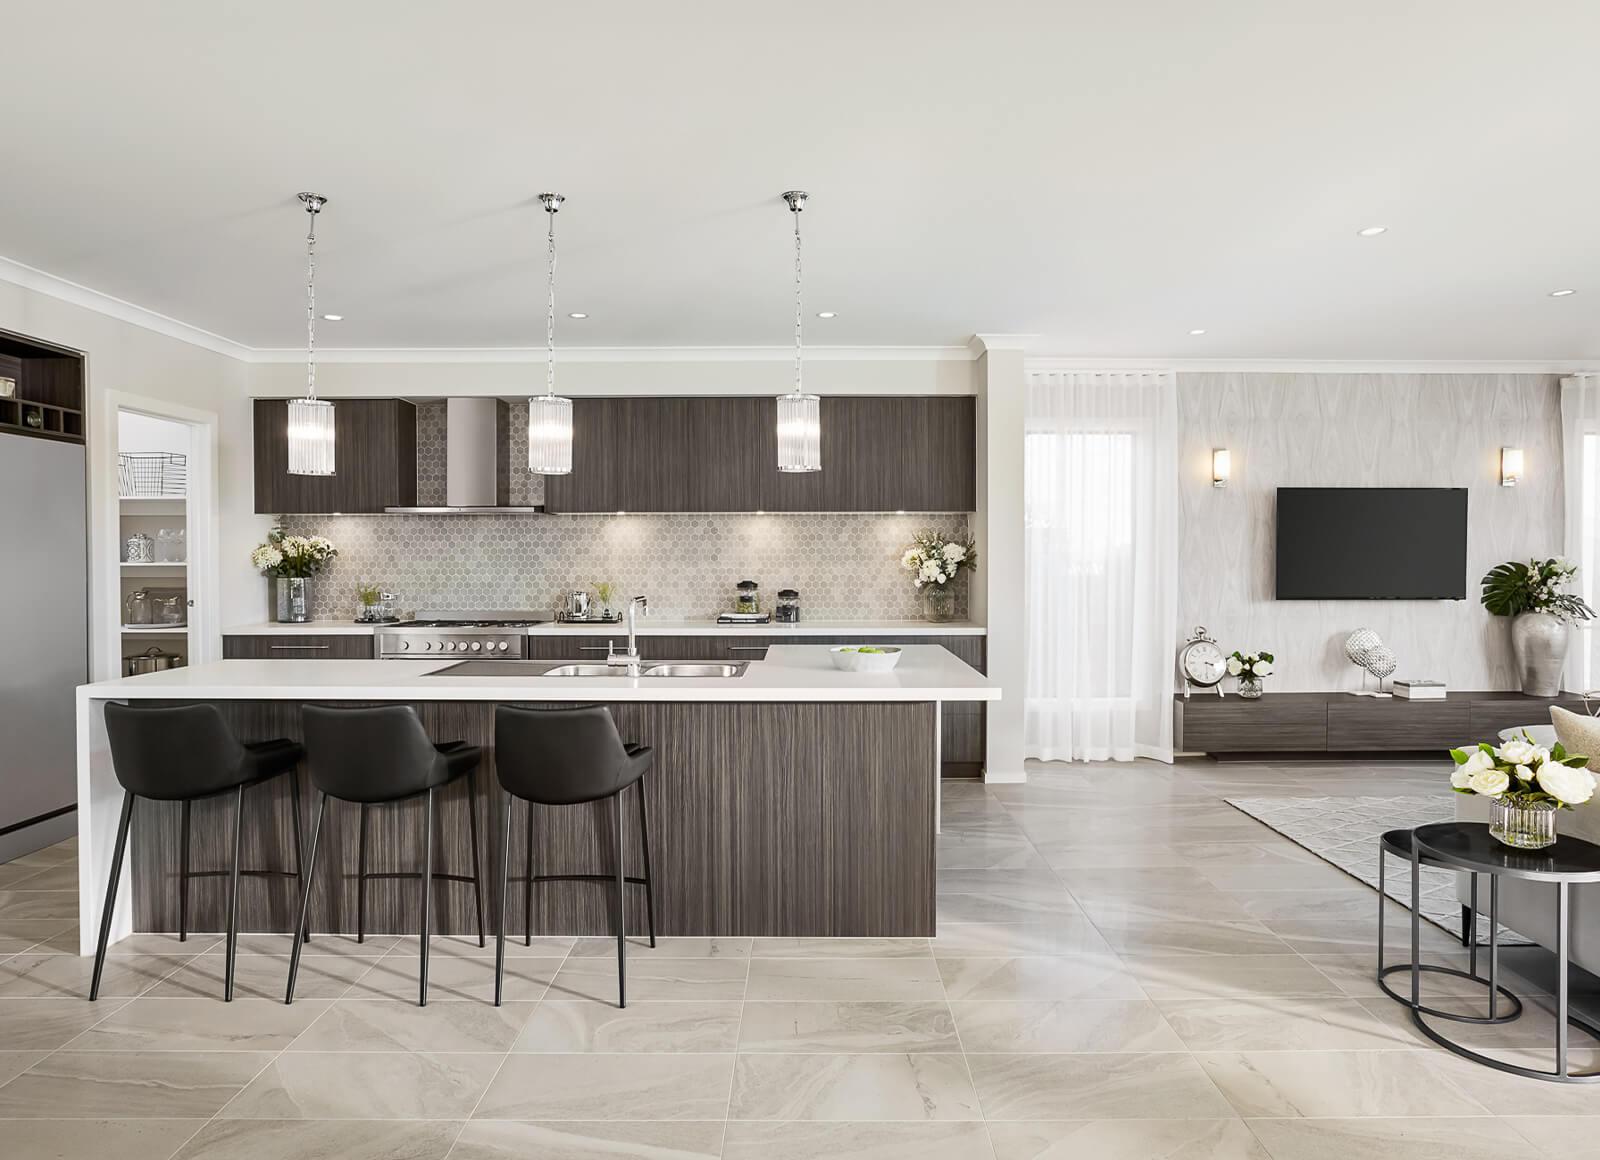 Kitchen Renovation Idea using Beaumont Tiles